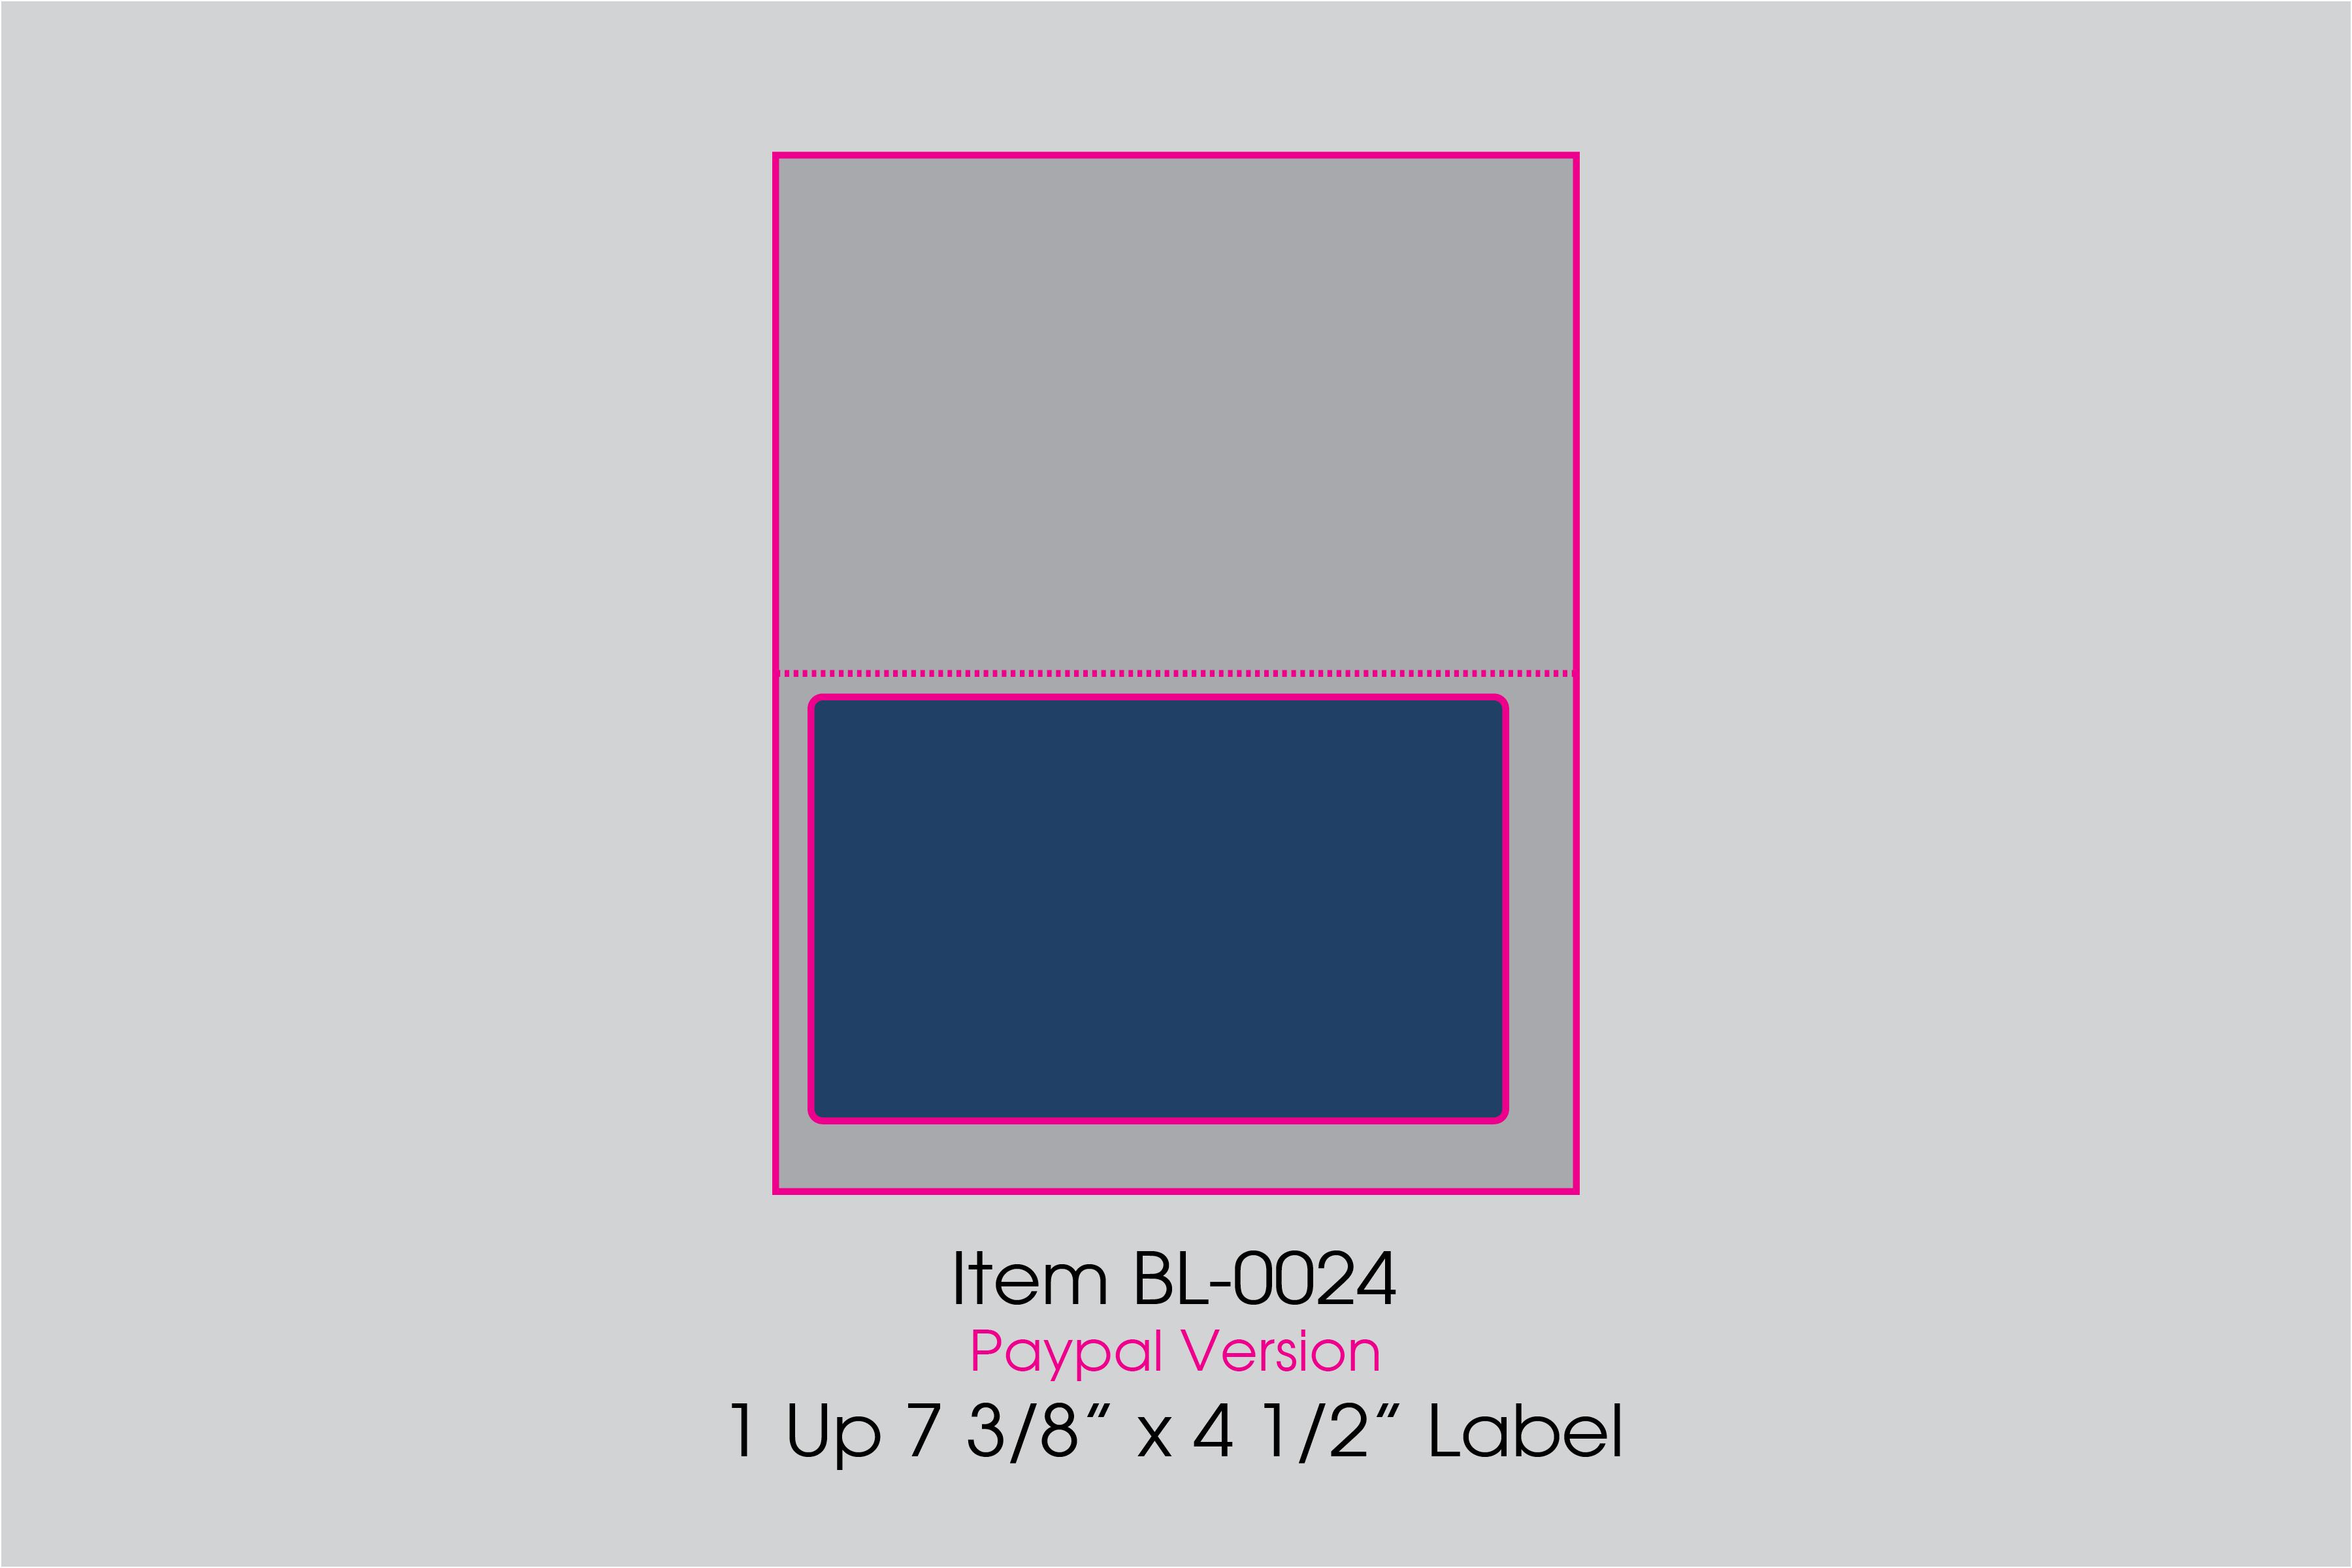 BL-0024